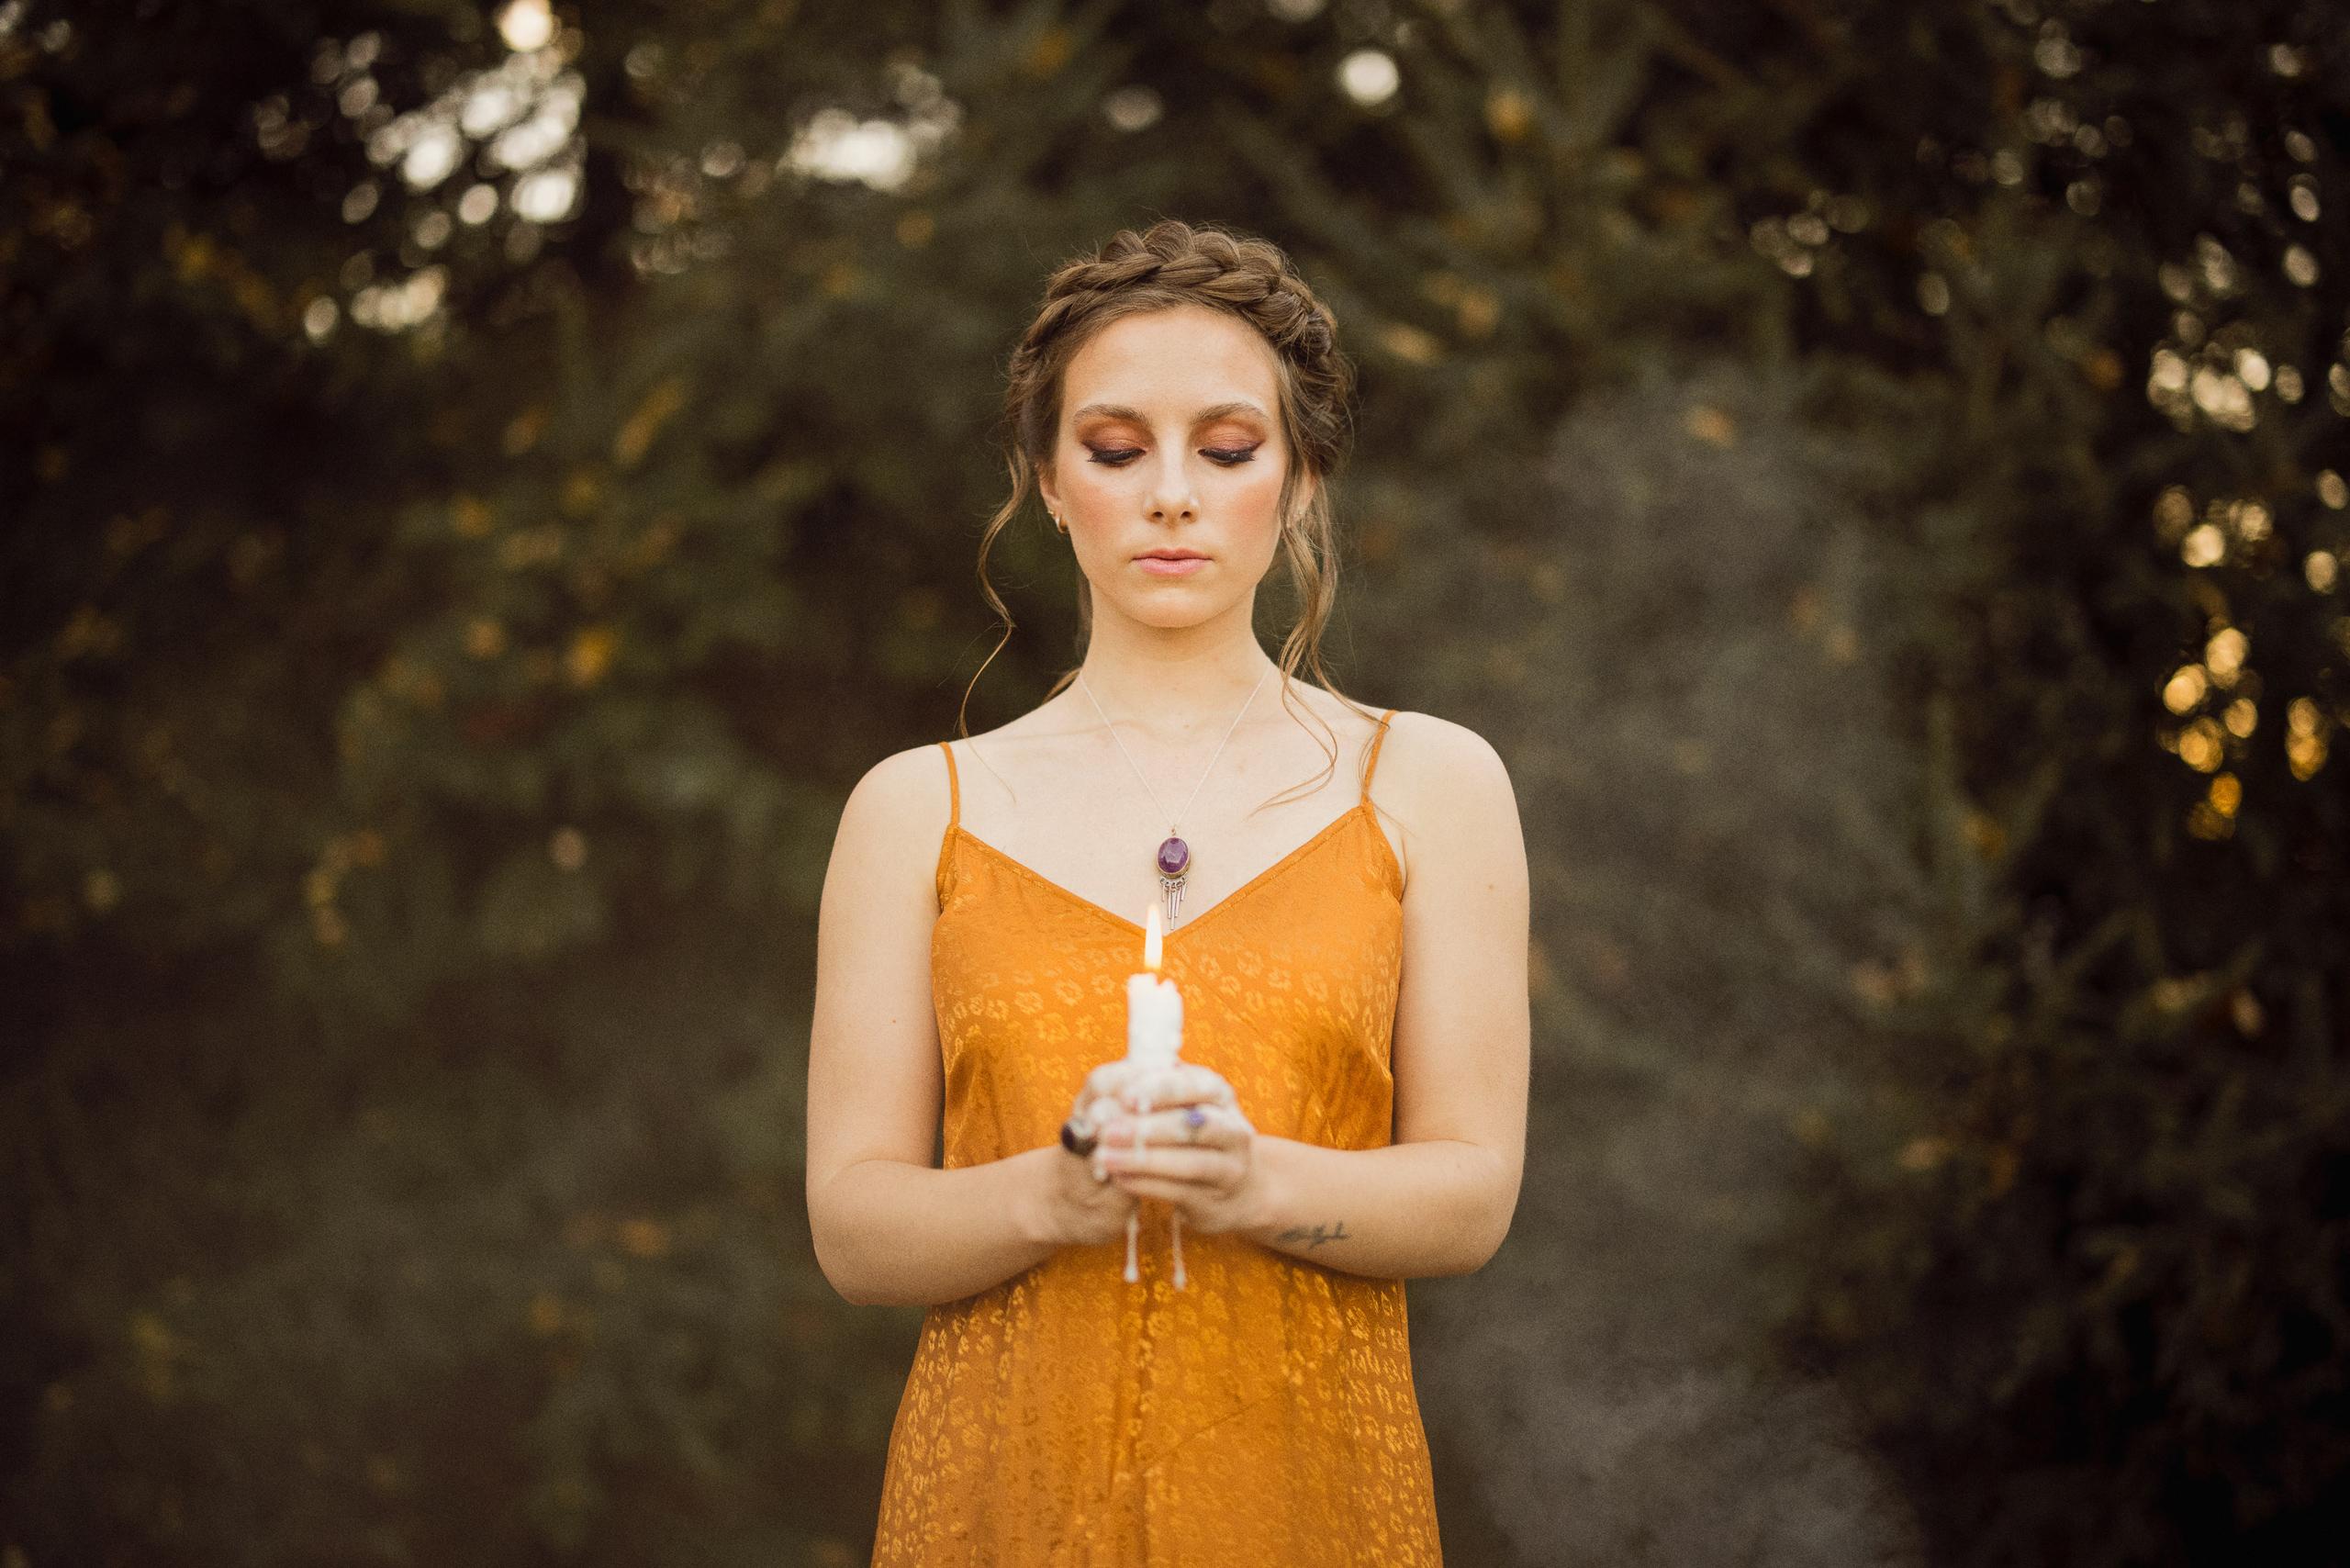 spooky fall bridesmaid golden dress niagara afterglow images